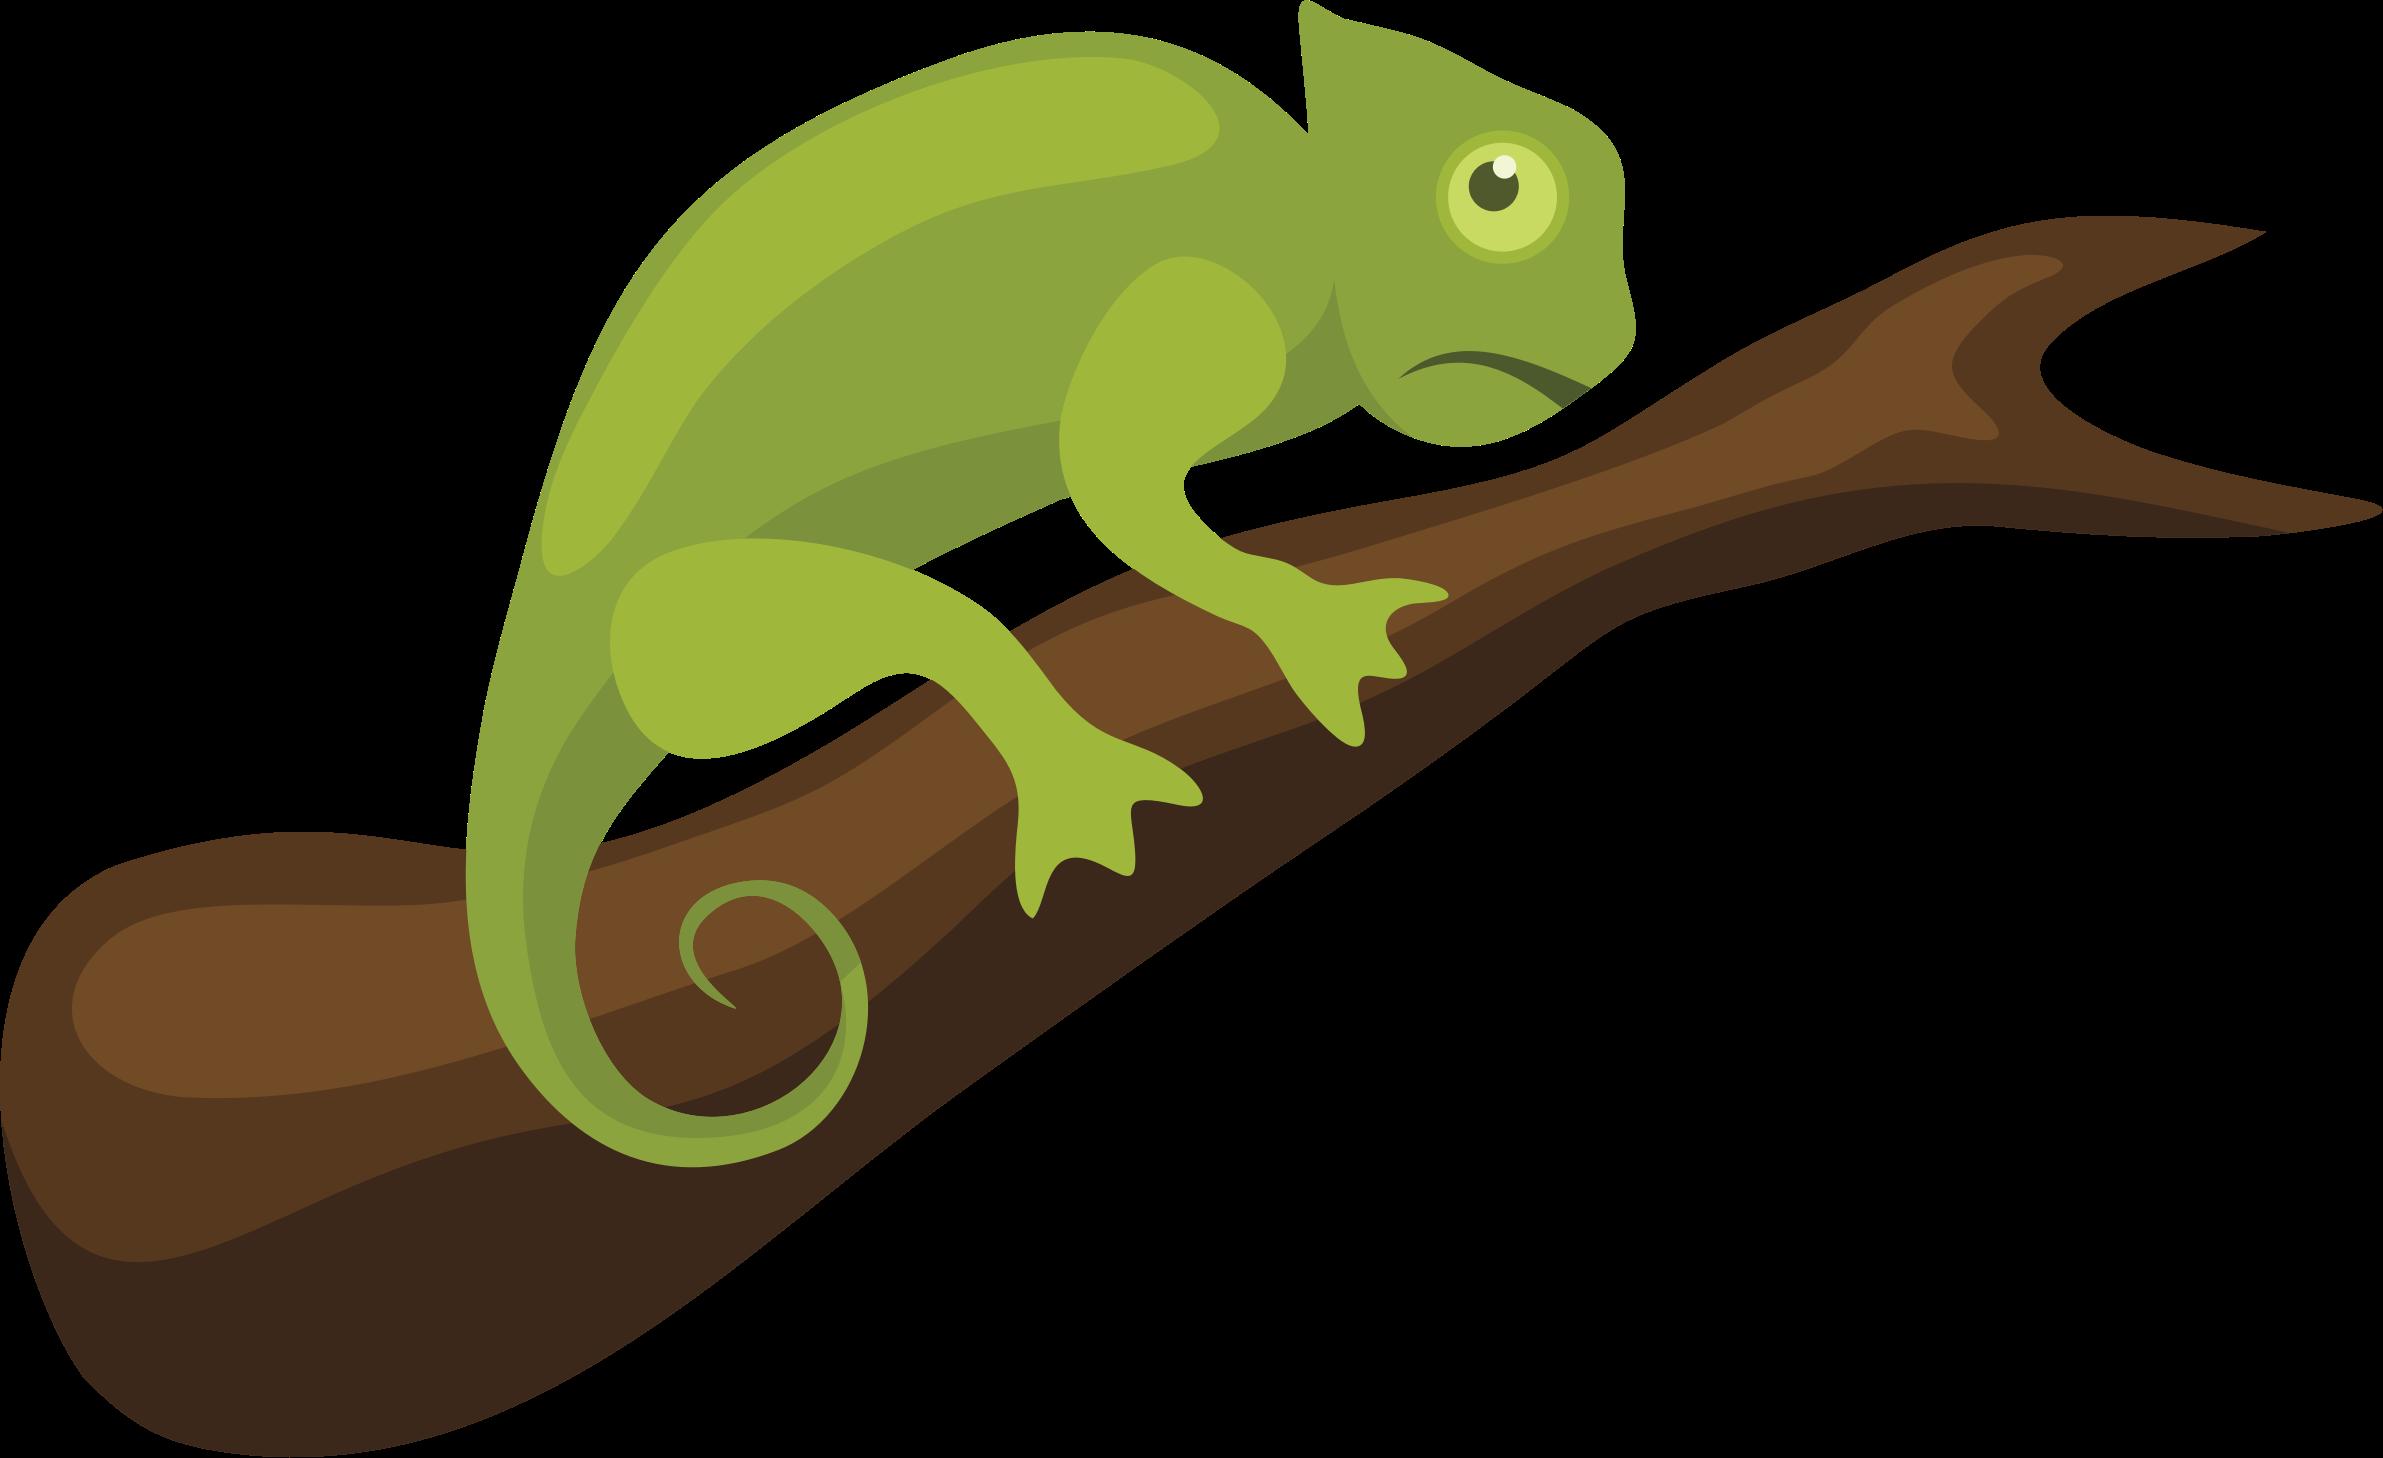 2383x1458 Incredible Ideas Chameleon Clip Art